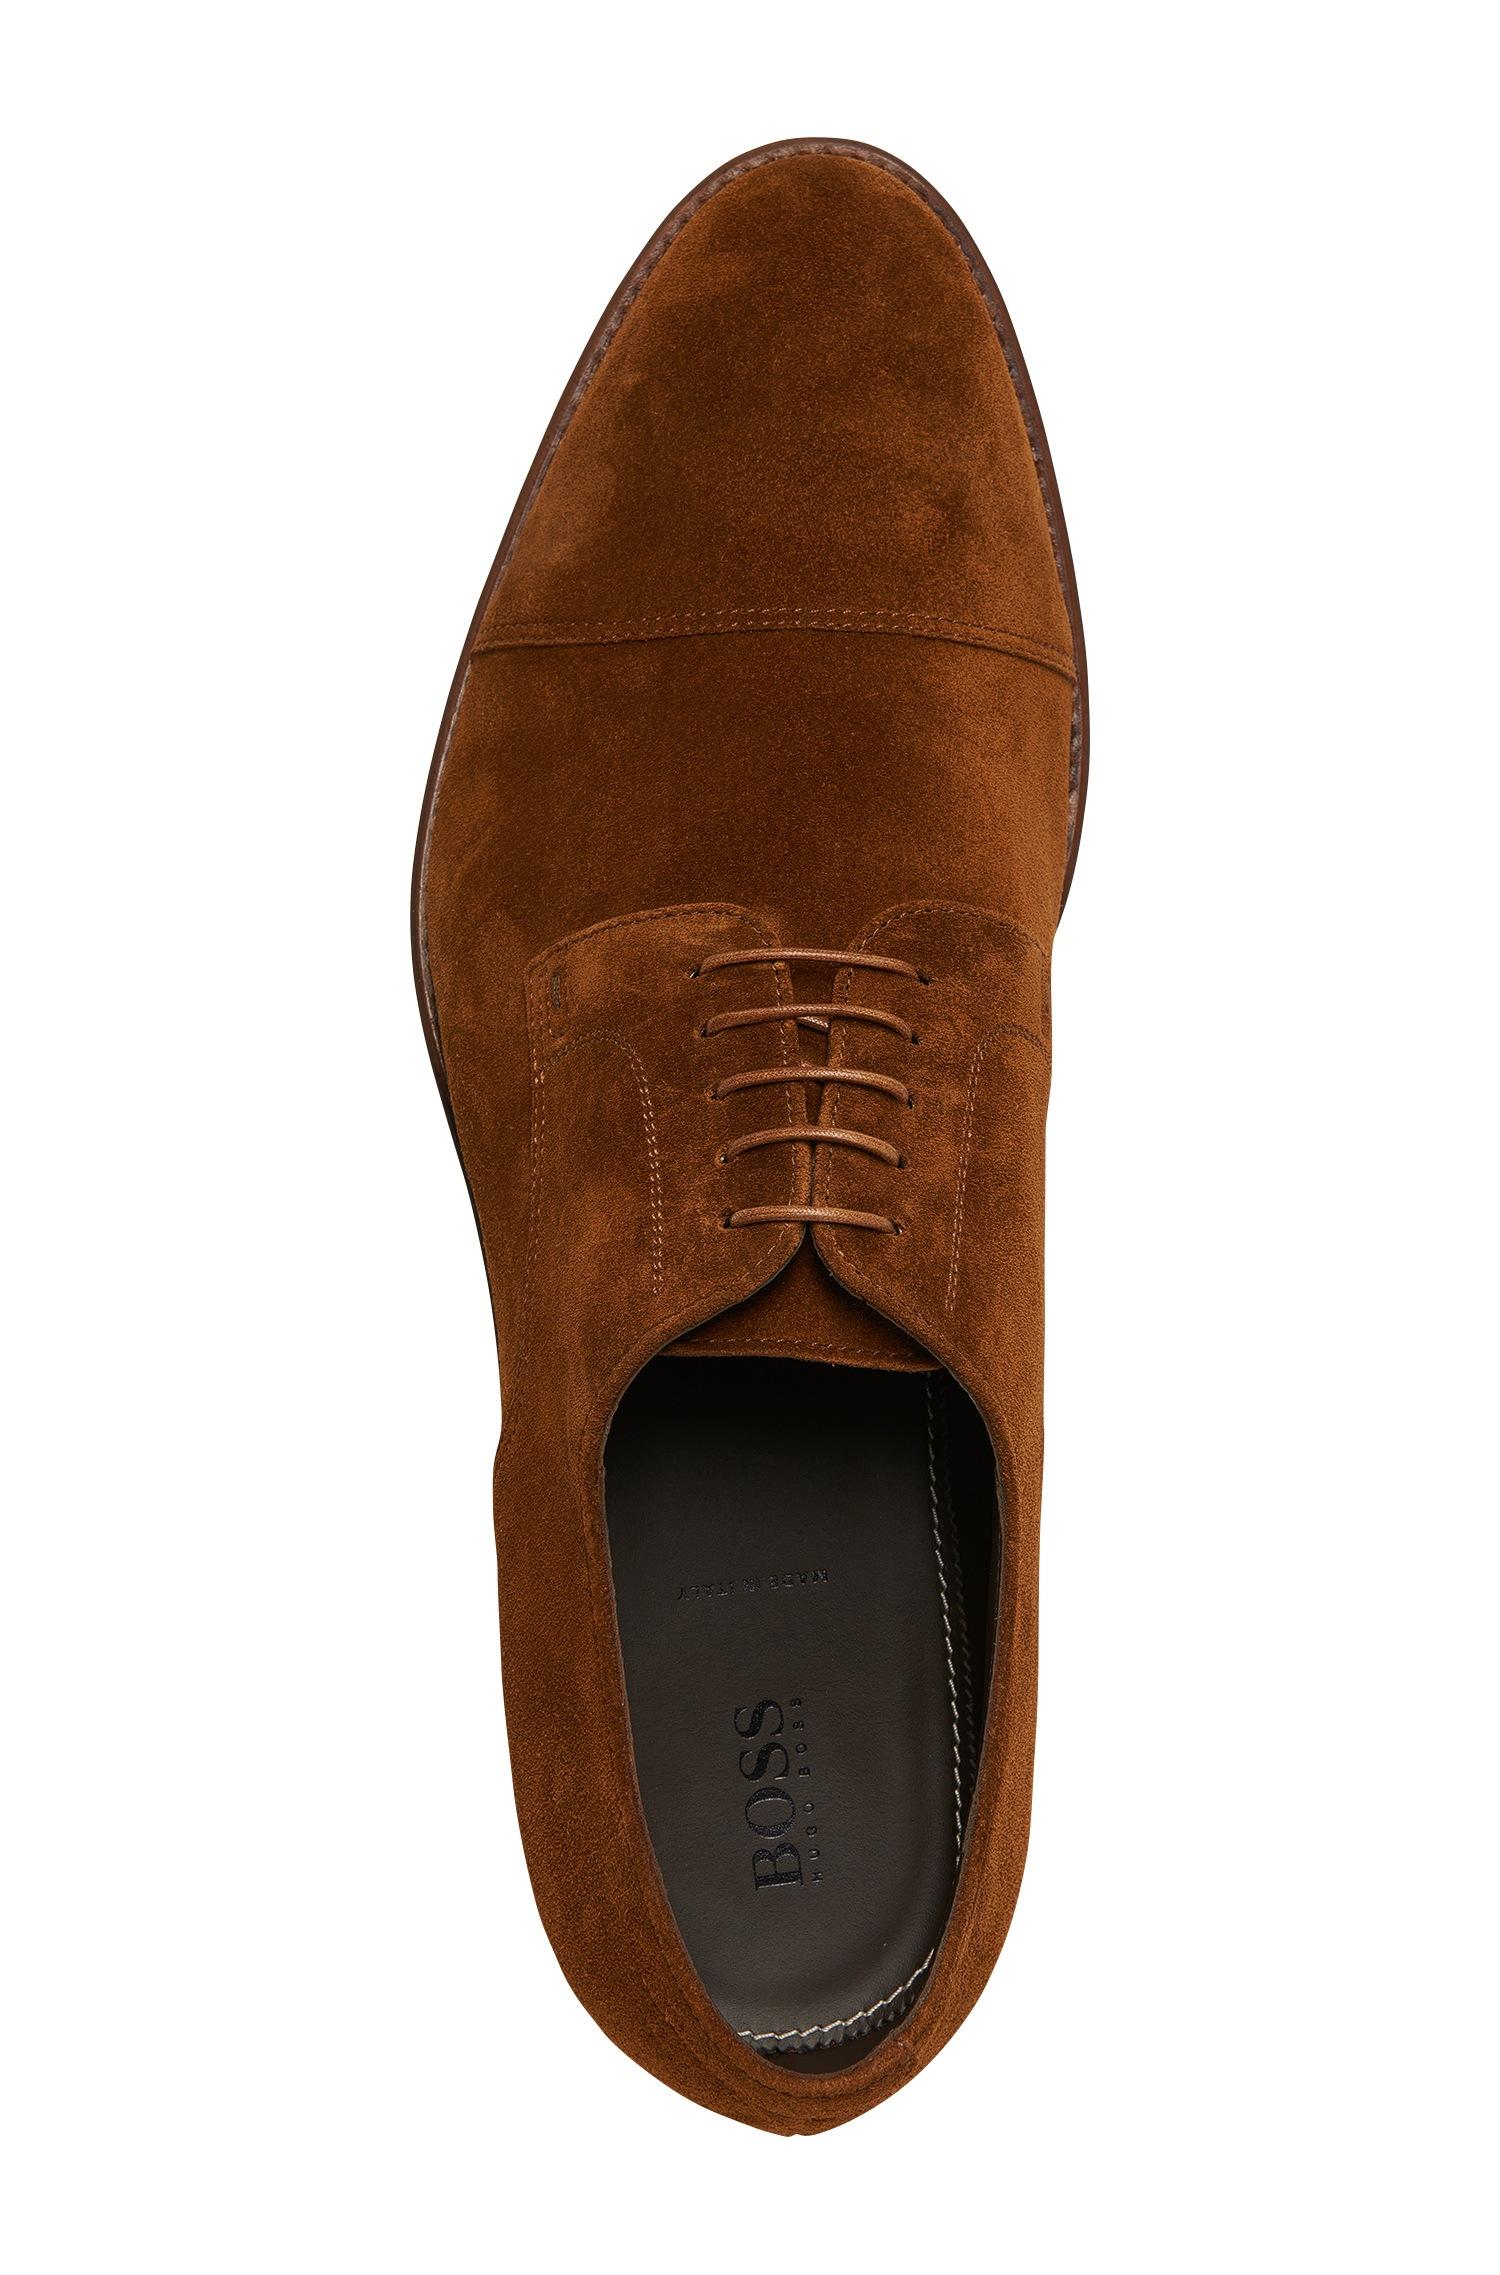 Hugo Boss Dress Shoes Canada